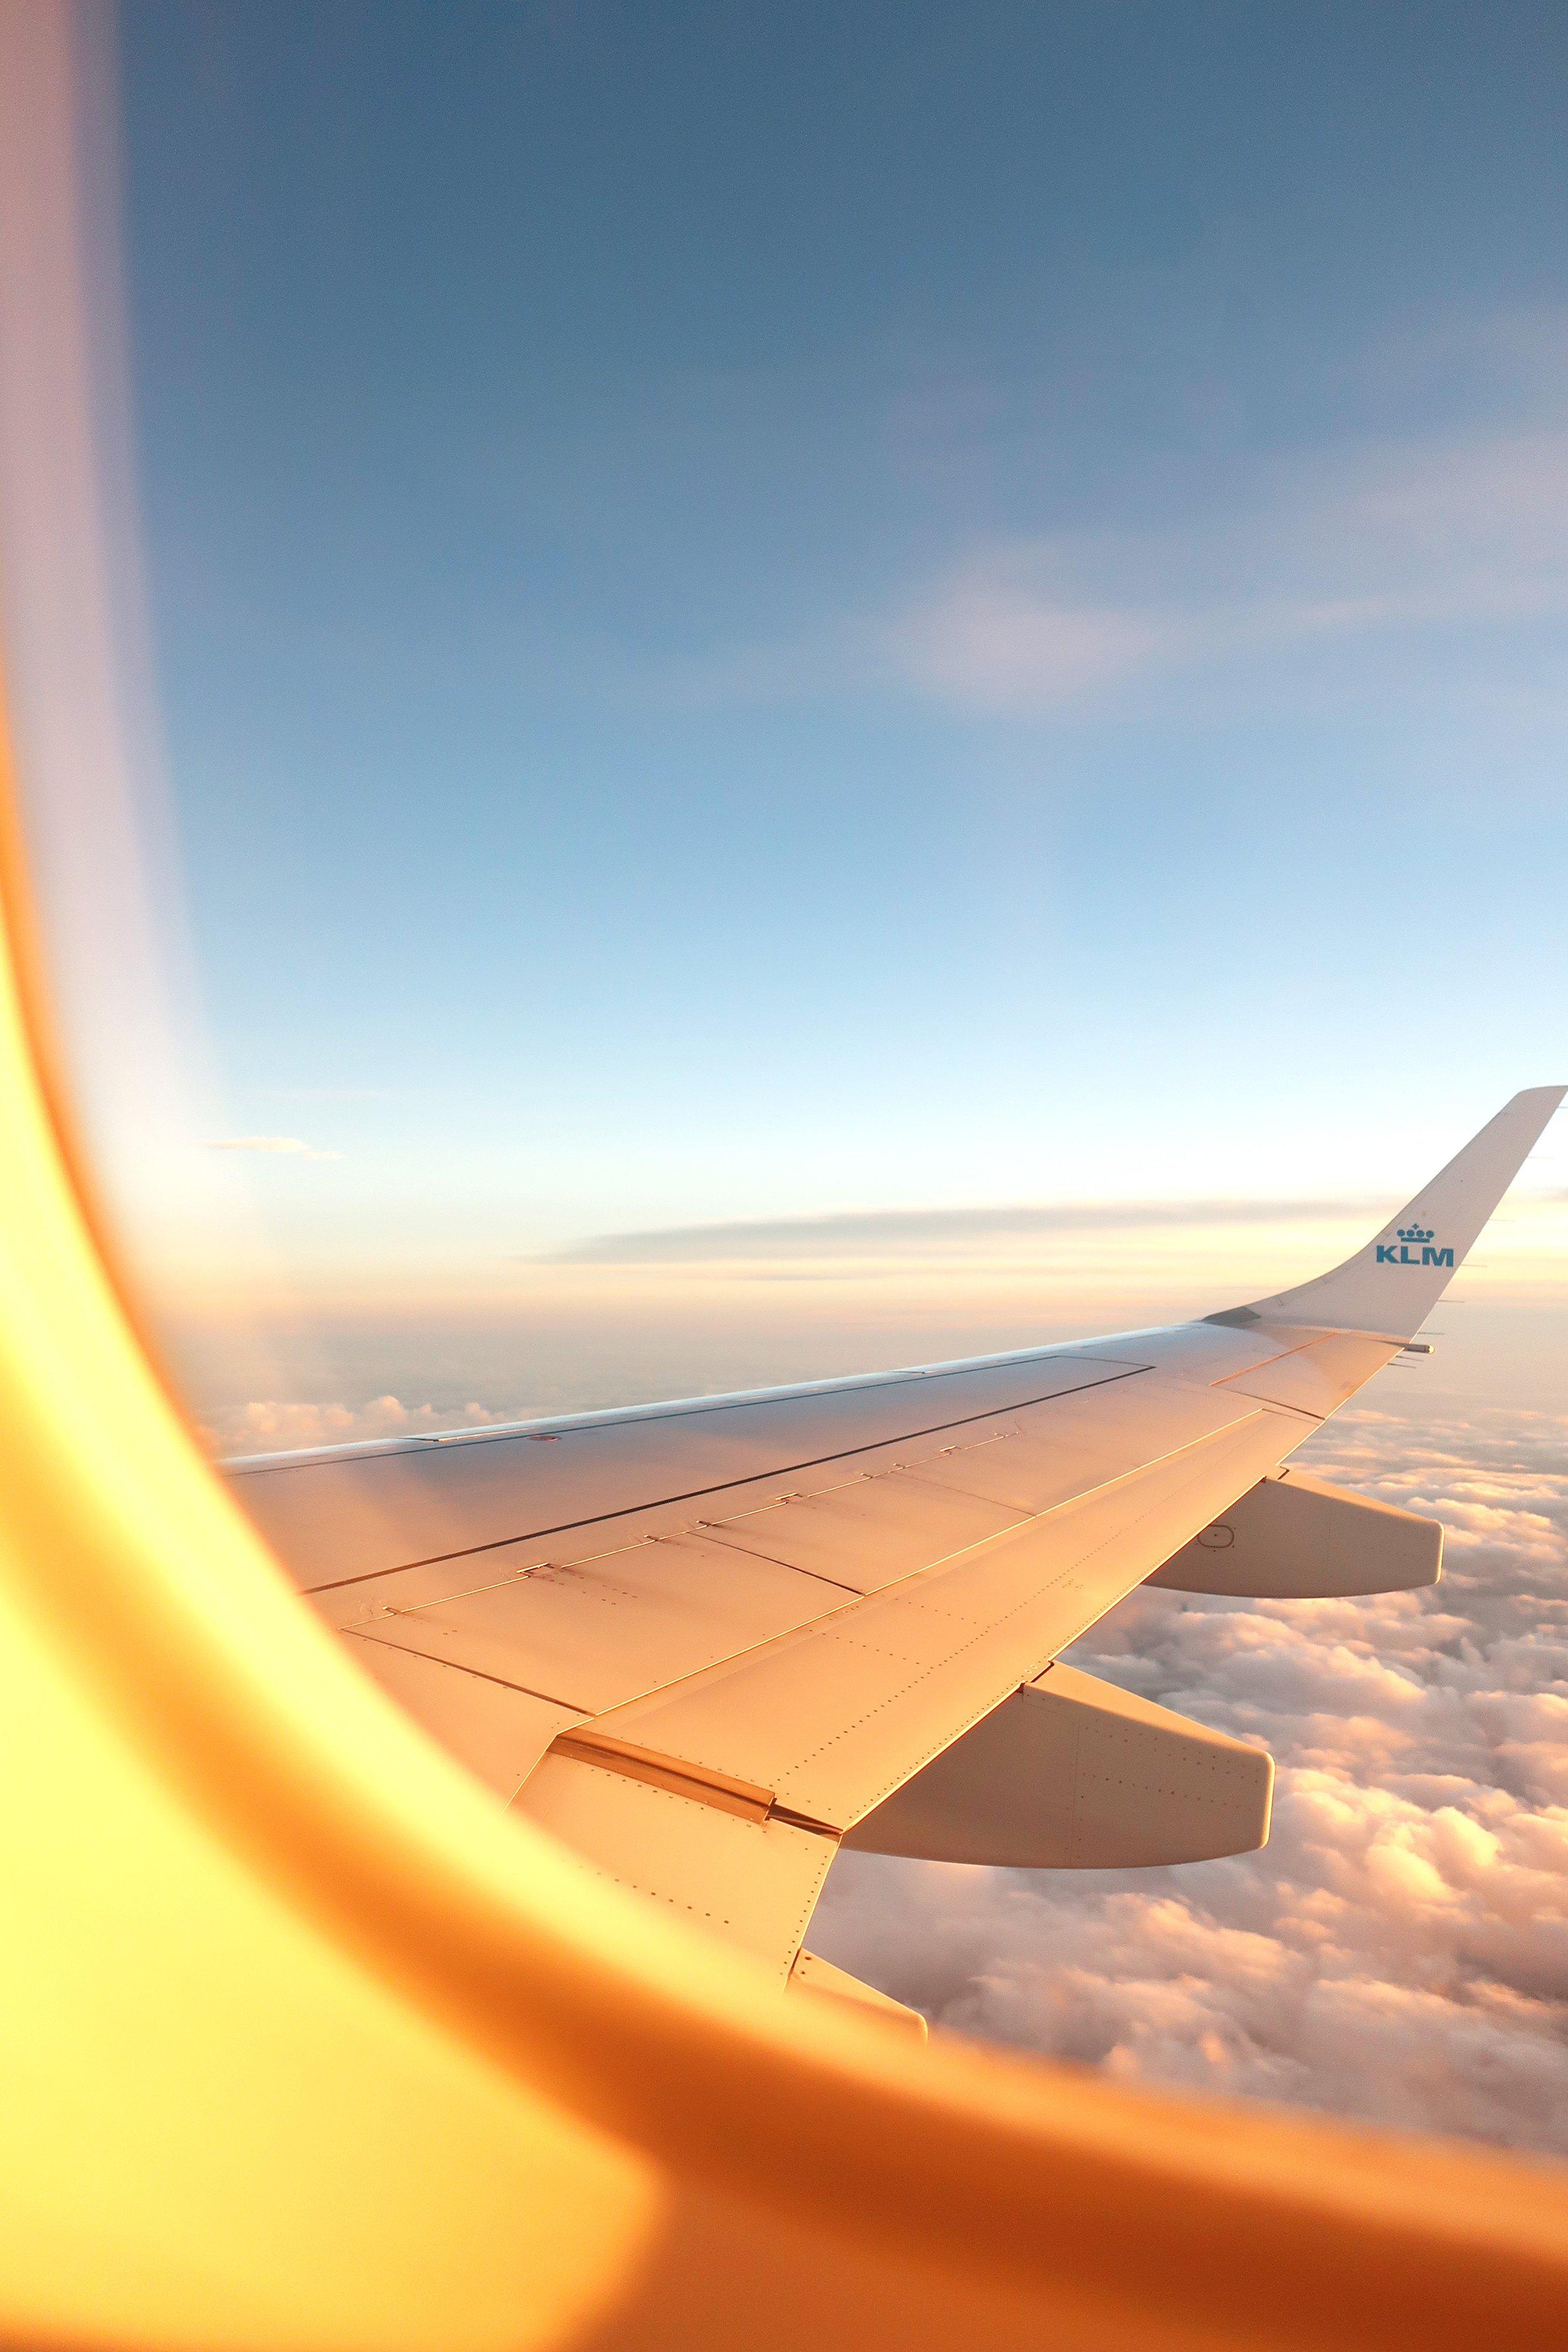 View from an airplane. Photo source Sacha Verheij on Unsplash